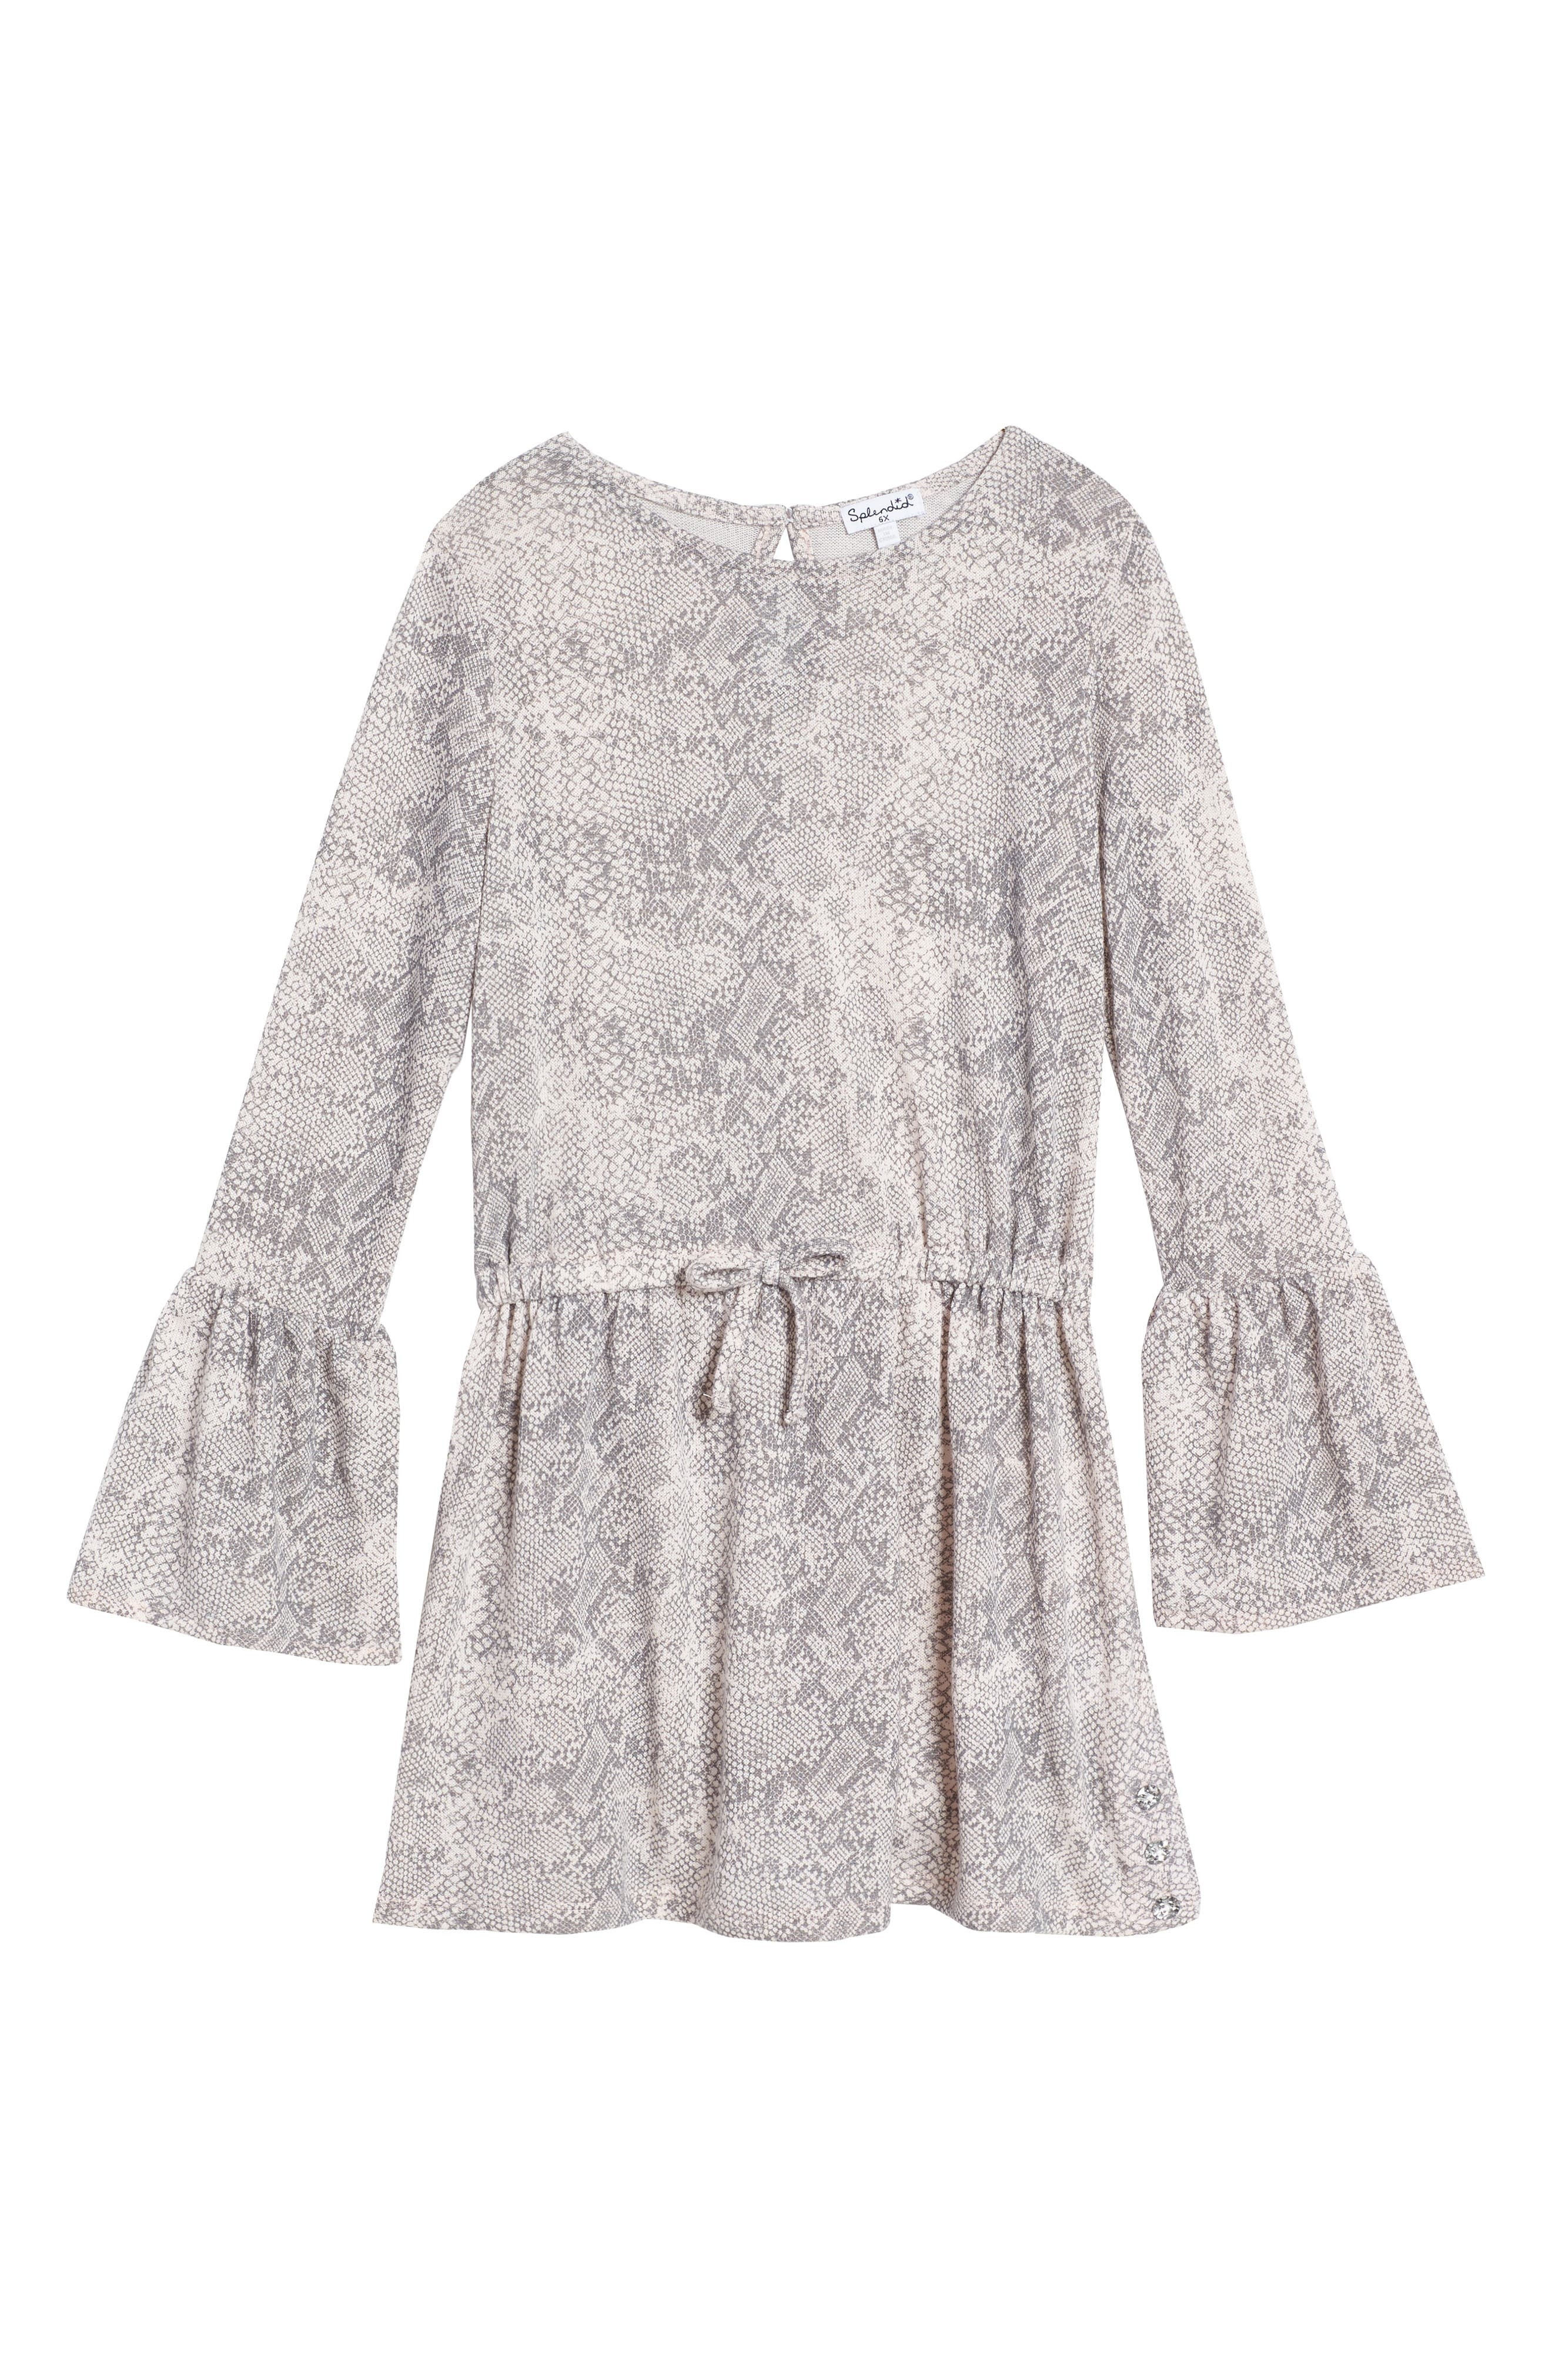 Python Print Loose Knit Dress,                         Main,                         color, Print